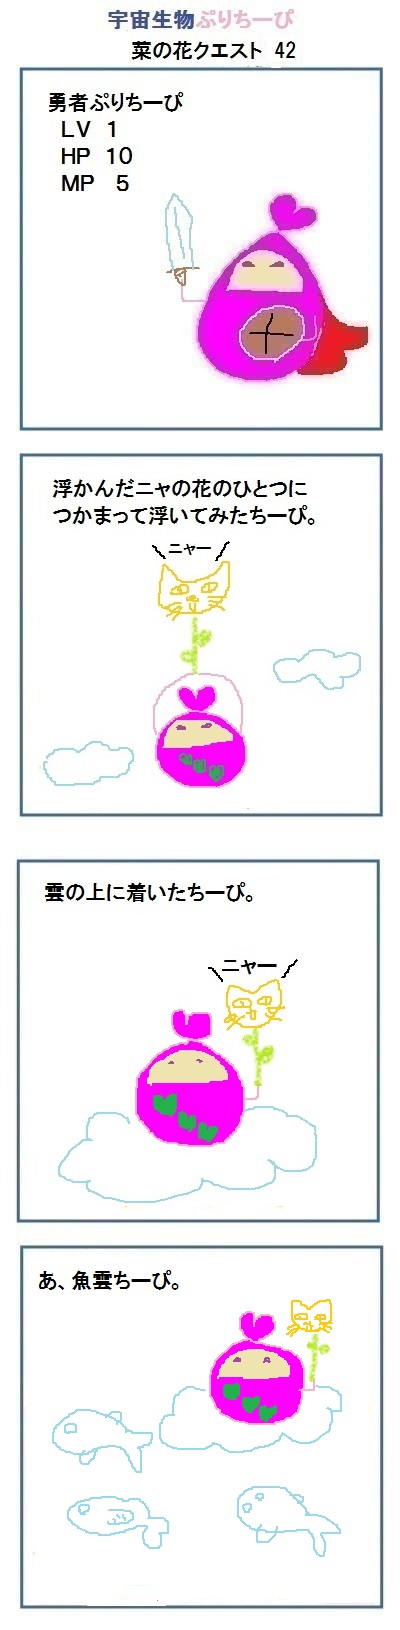 160429_nanohana_quest42.jpg